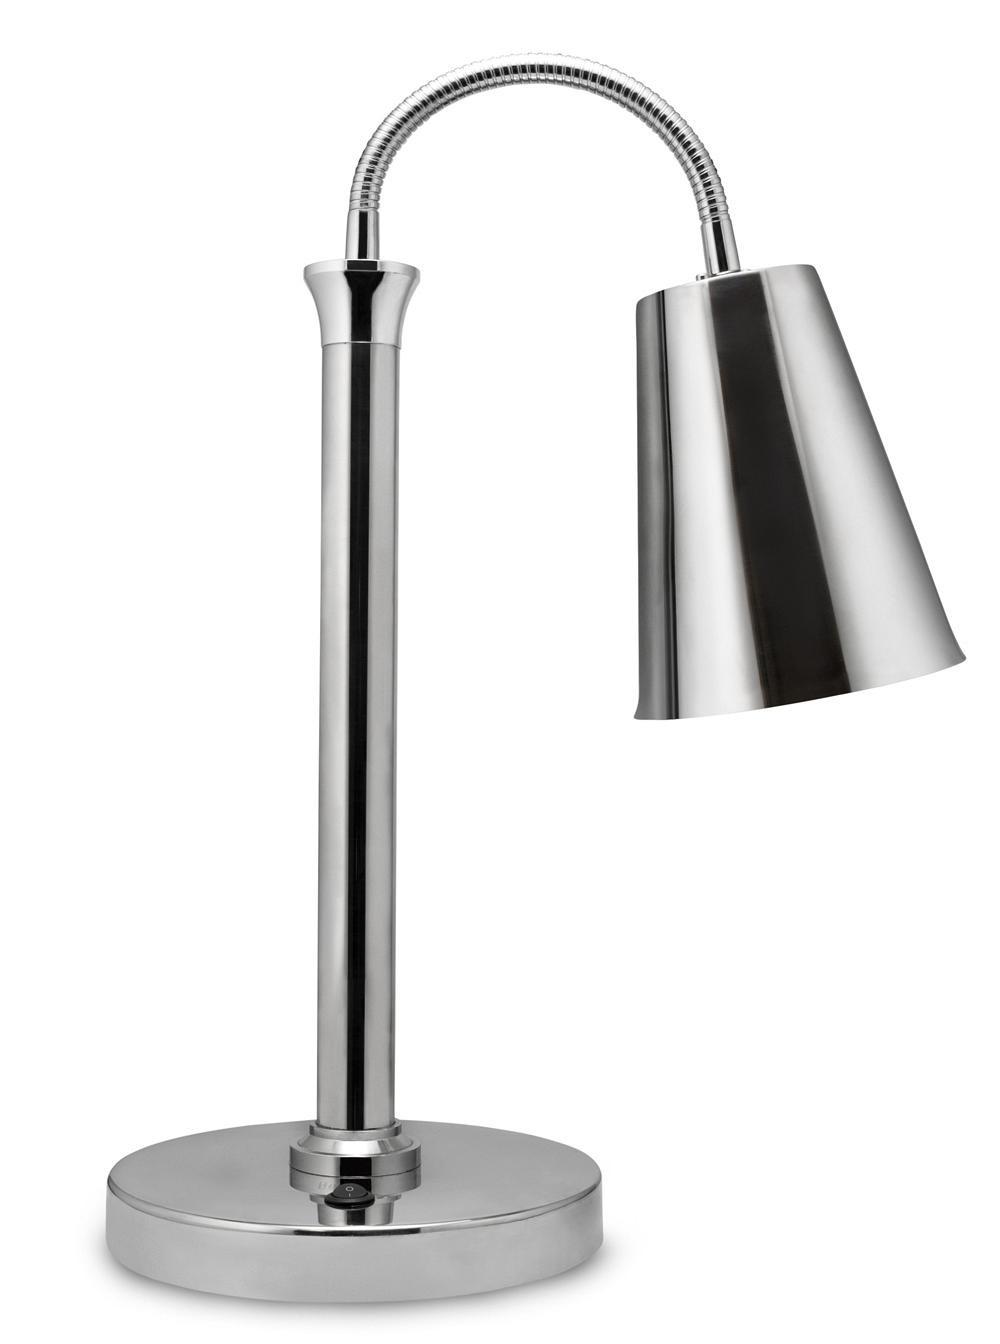 "Bon Chef 9669 Single Bulb Heat Lamp with Chrome Shade, 23"" H."